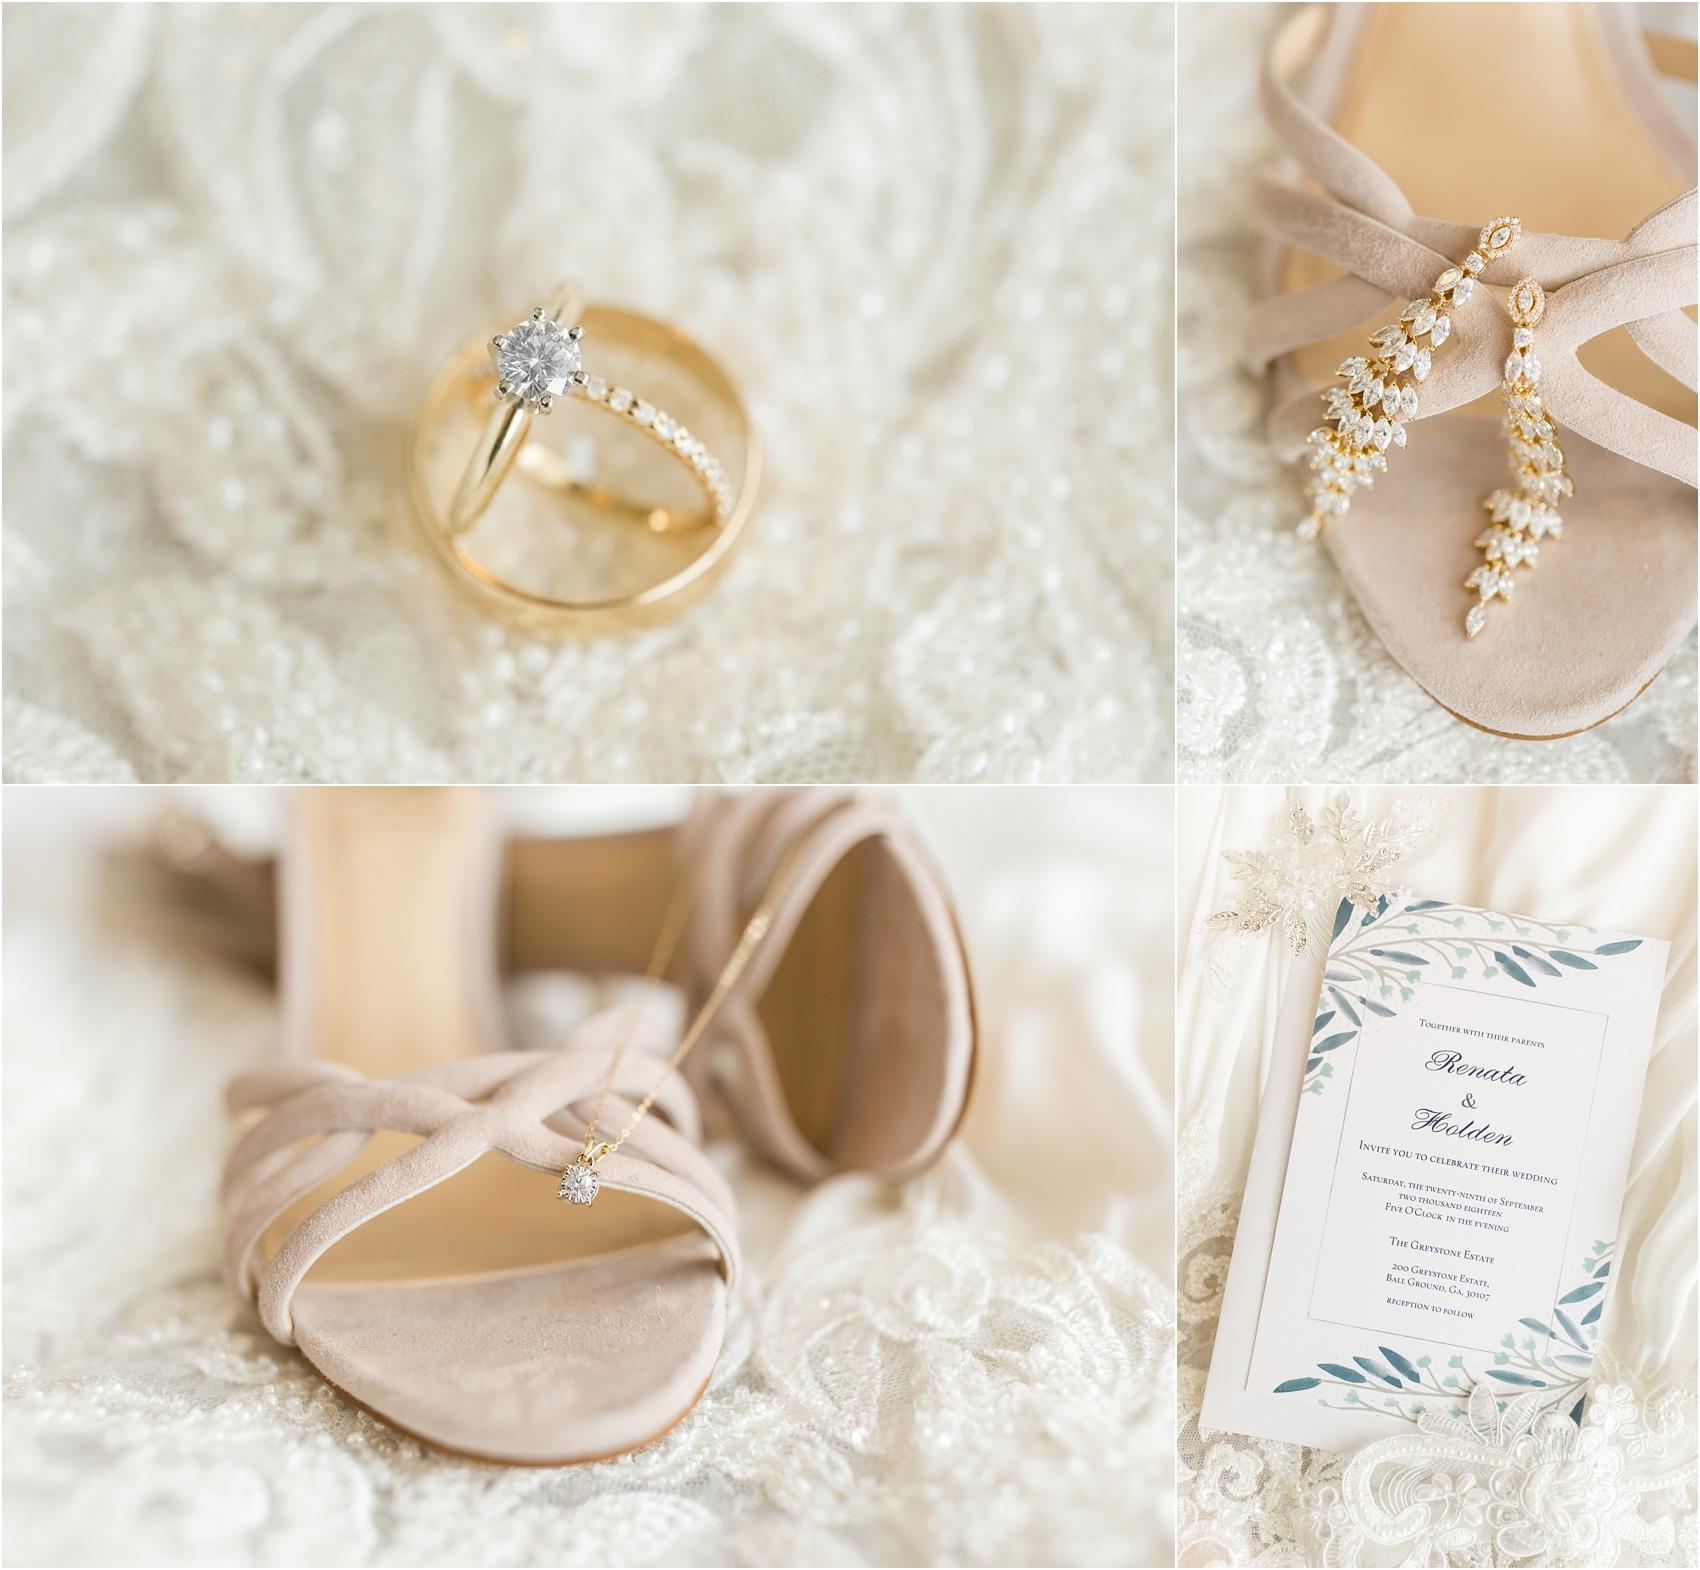 Savannah Eve Photography- Jurek-Woodworth Wedding- Sneak Peek-5.jpg